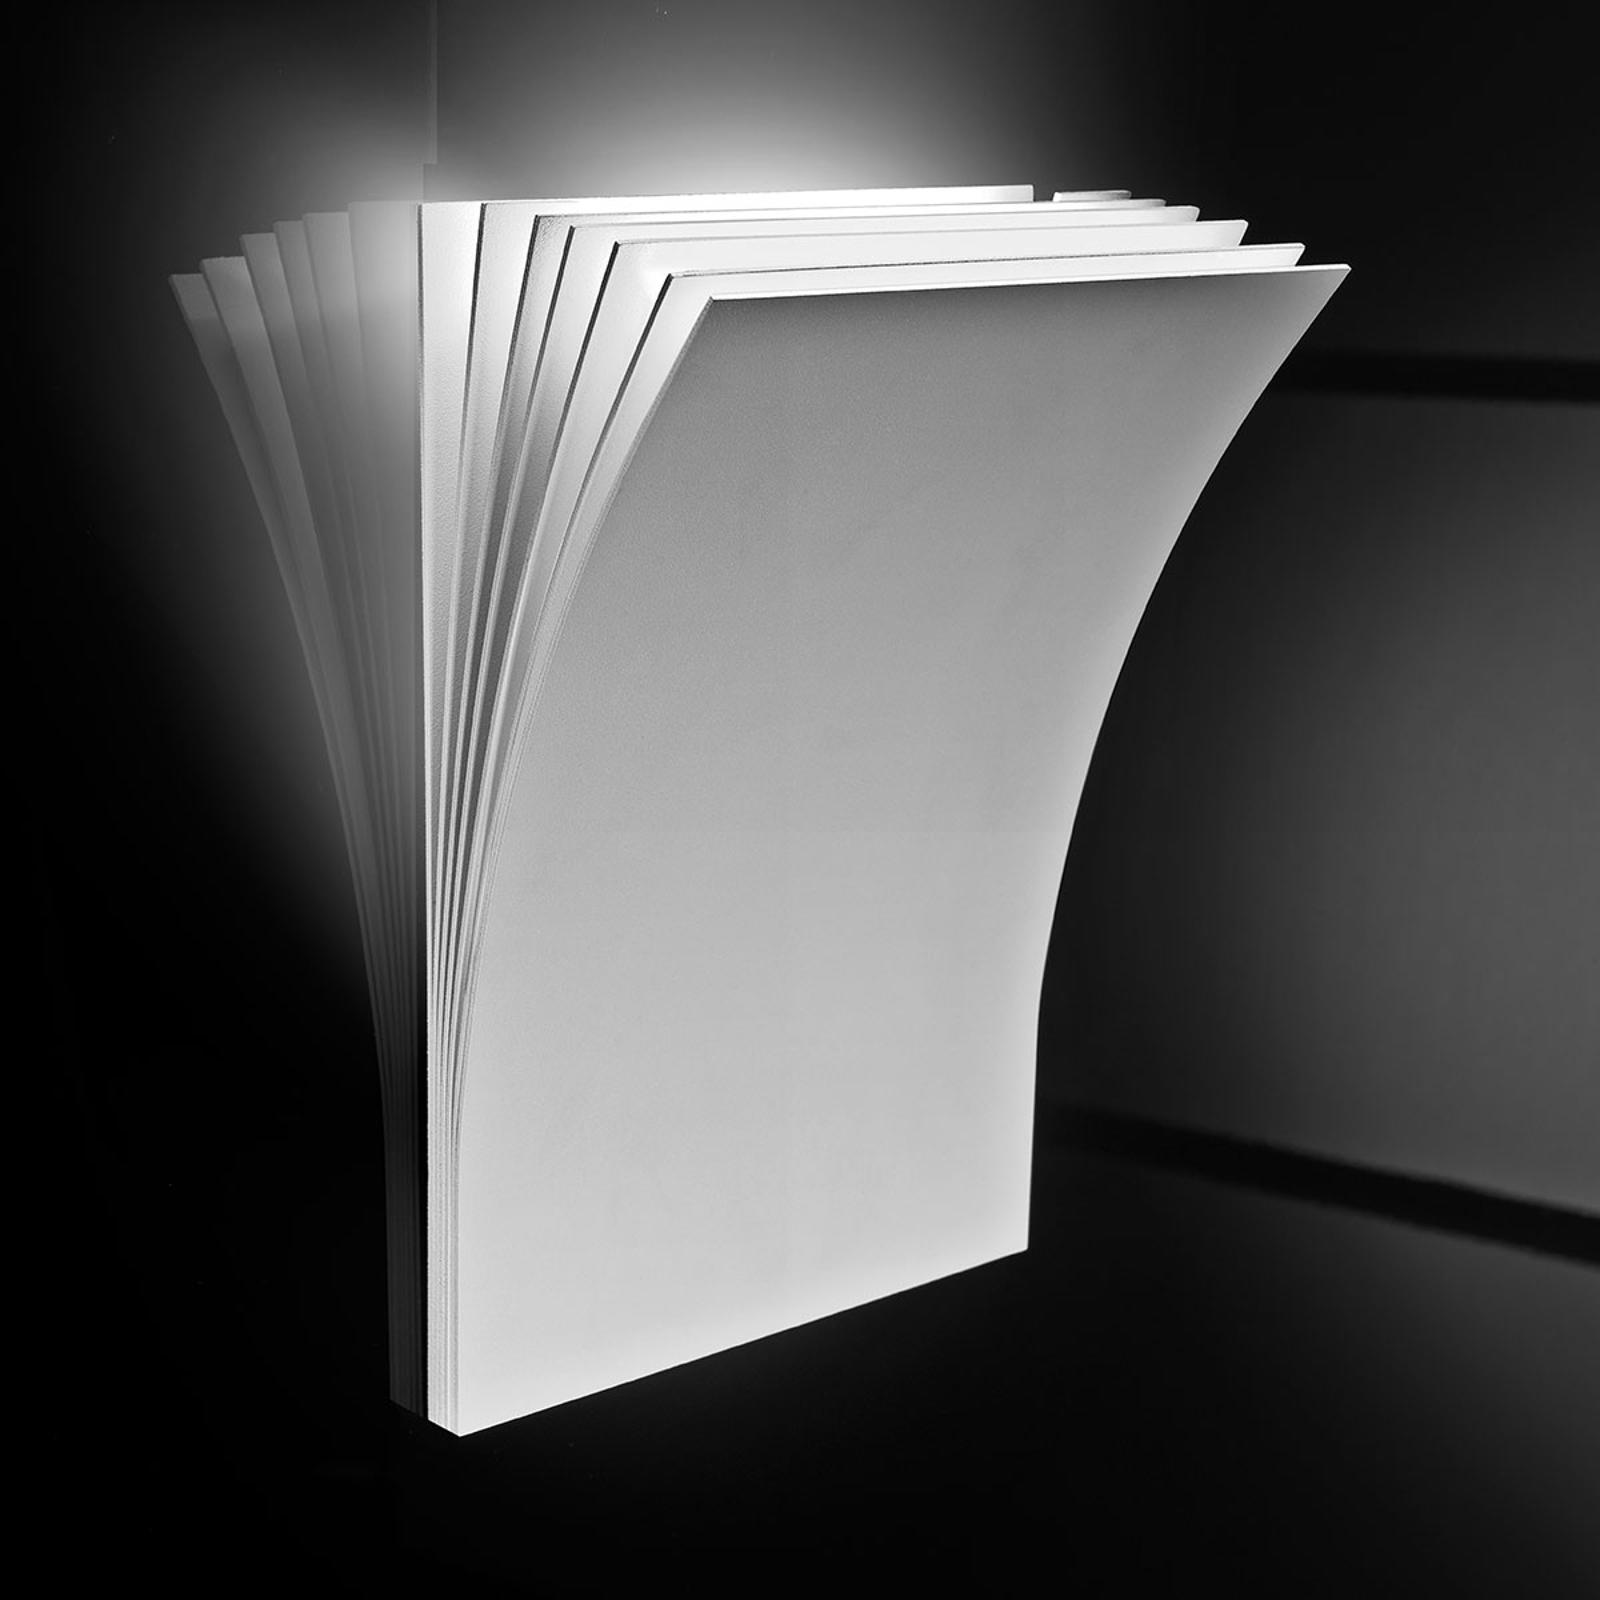 Axolight Polia LED wandlamp in wit 19cm